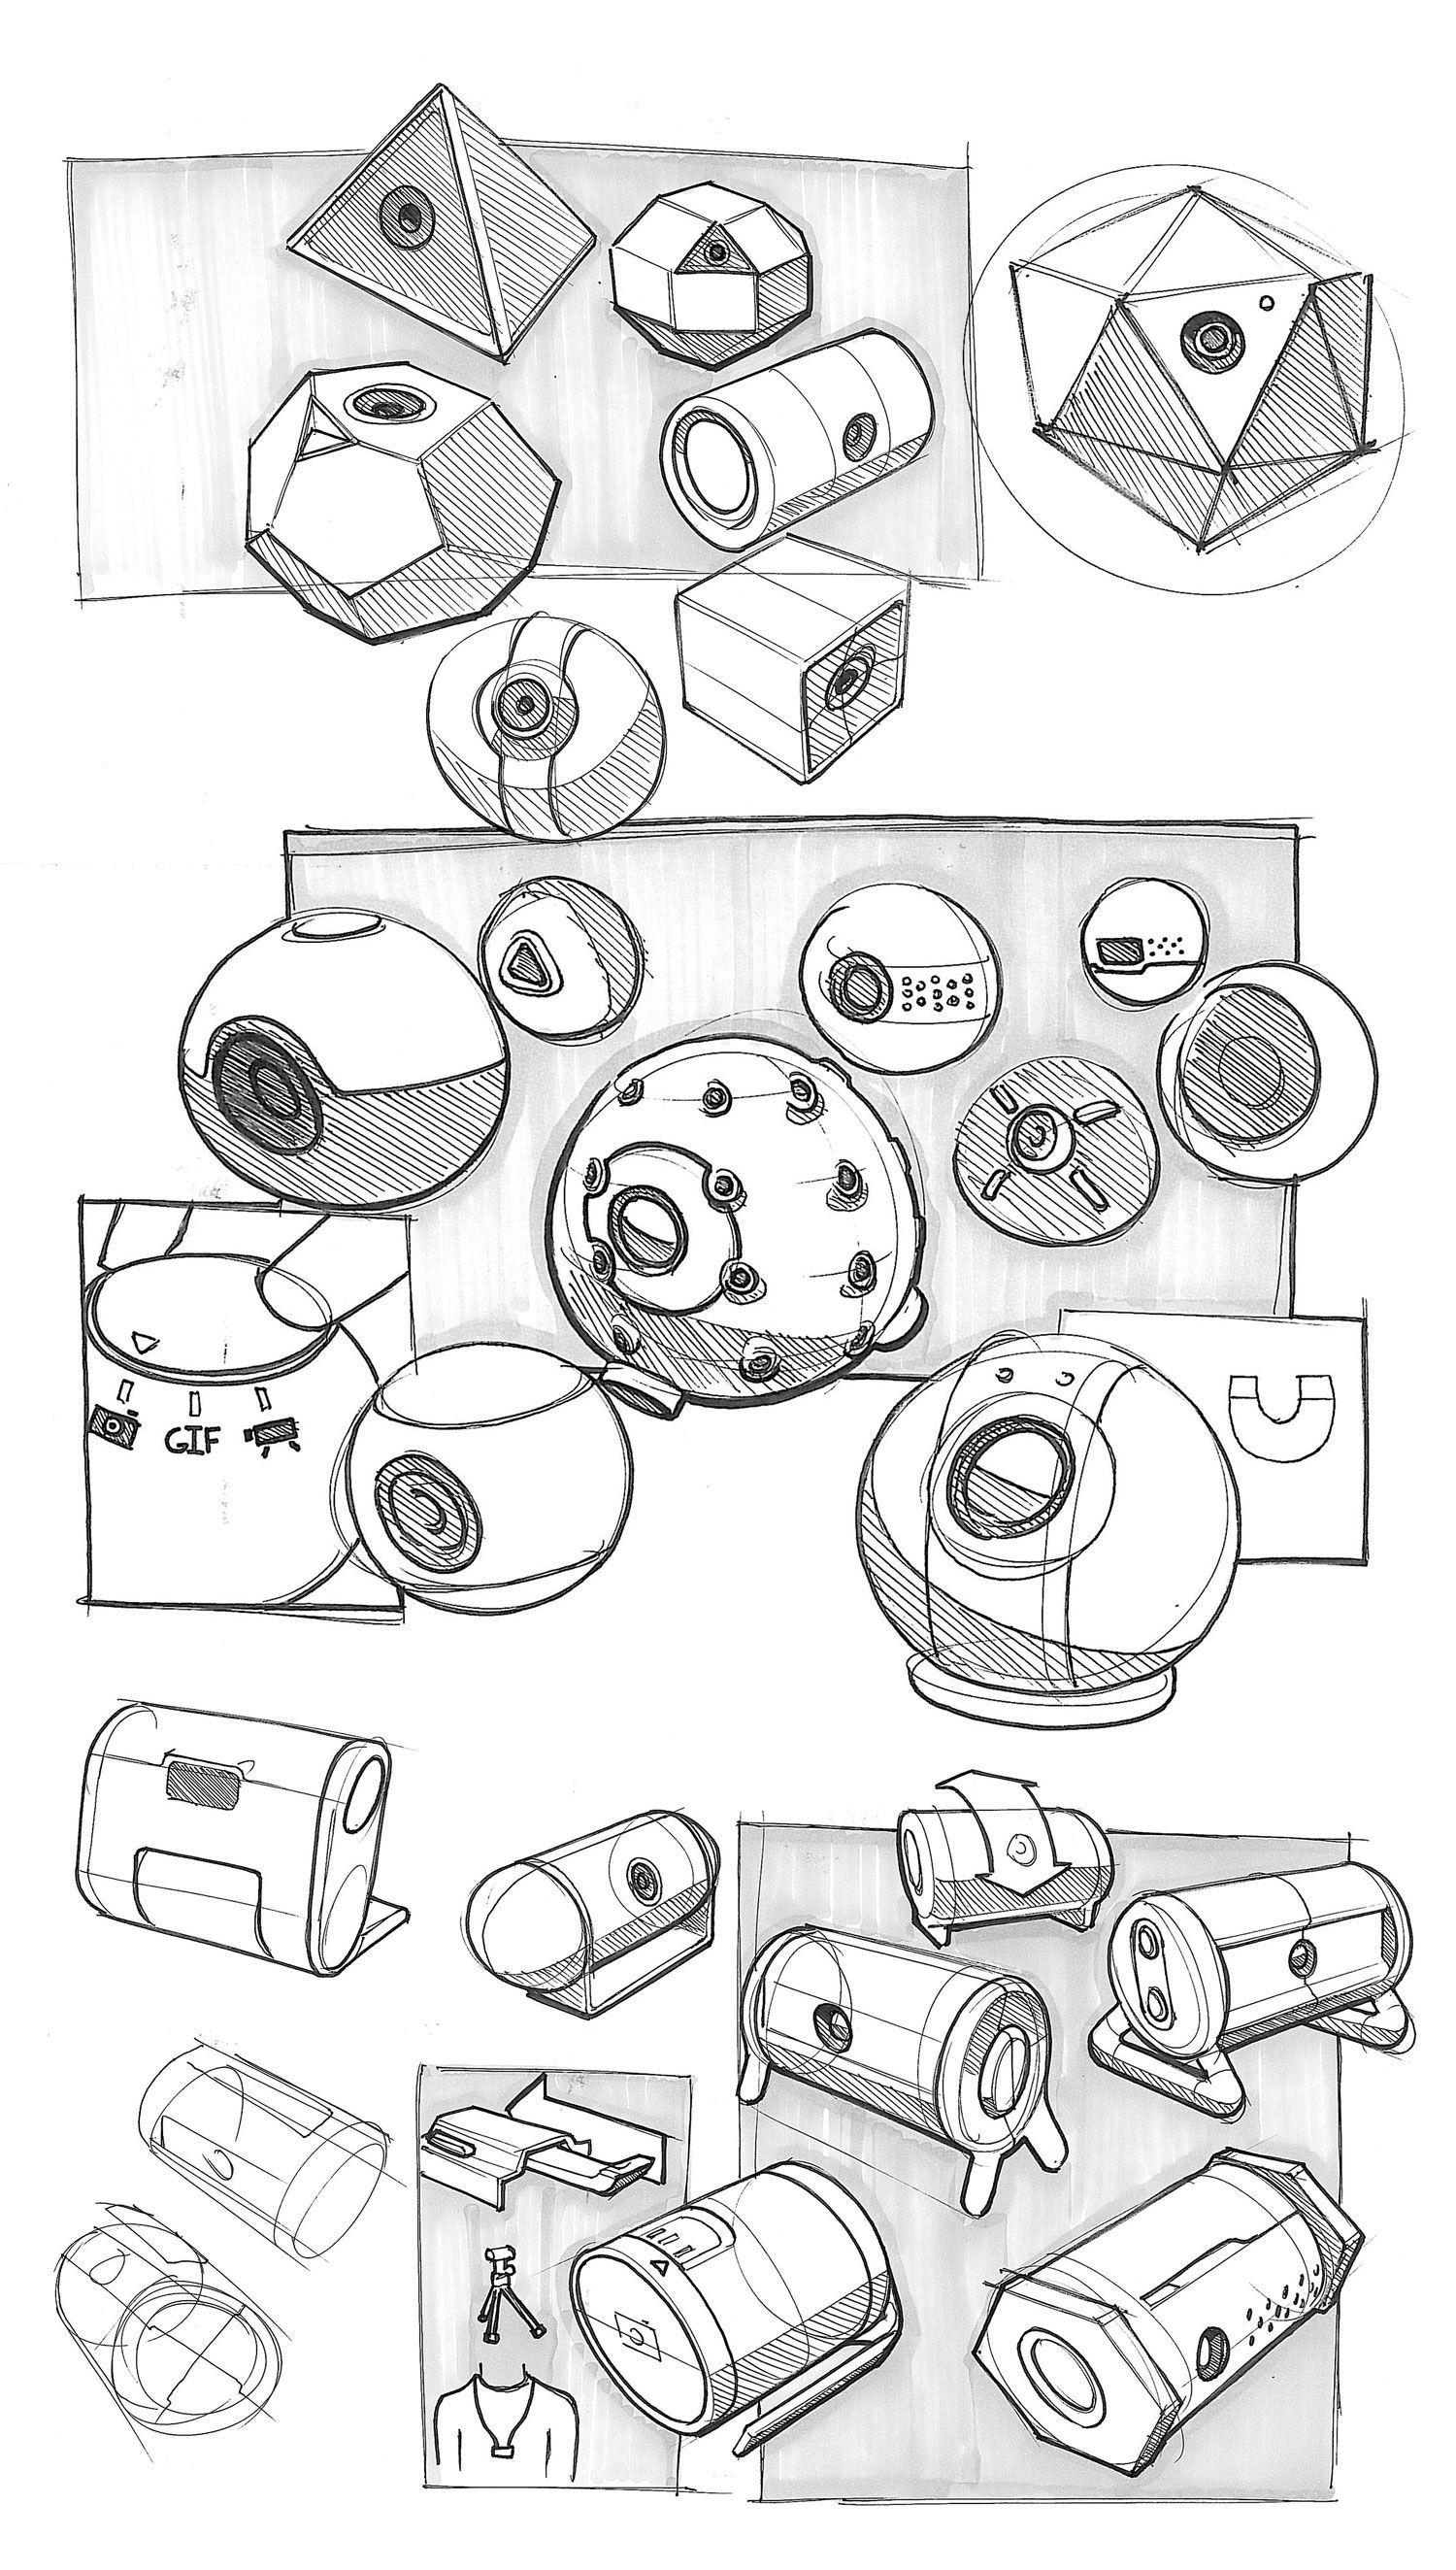 Camera Industrial Design Sketch Collage Drawings Jpg 1500 2647 Industrial Design Sketch Design Sketch Industrial Design